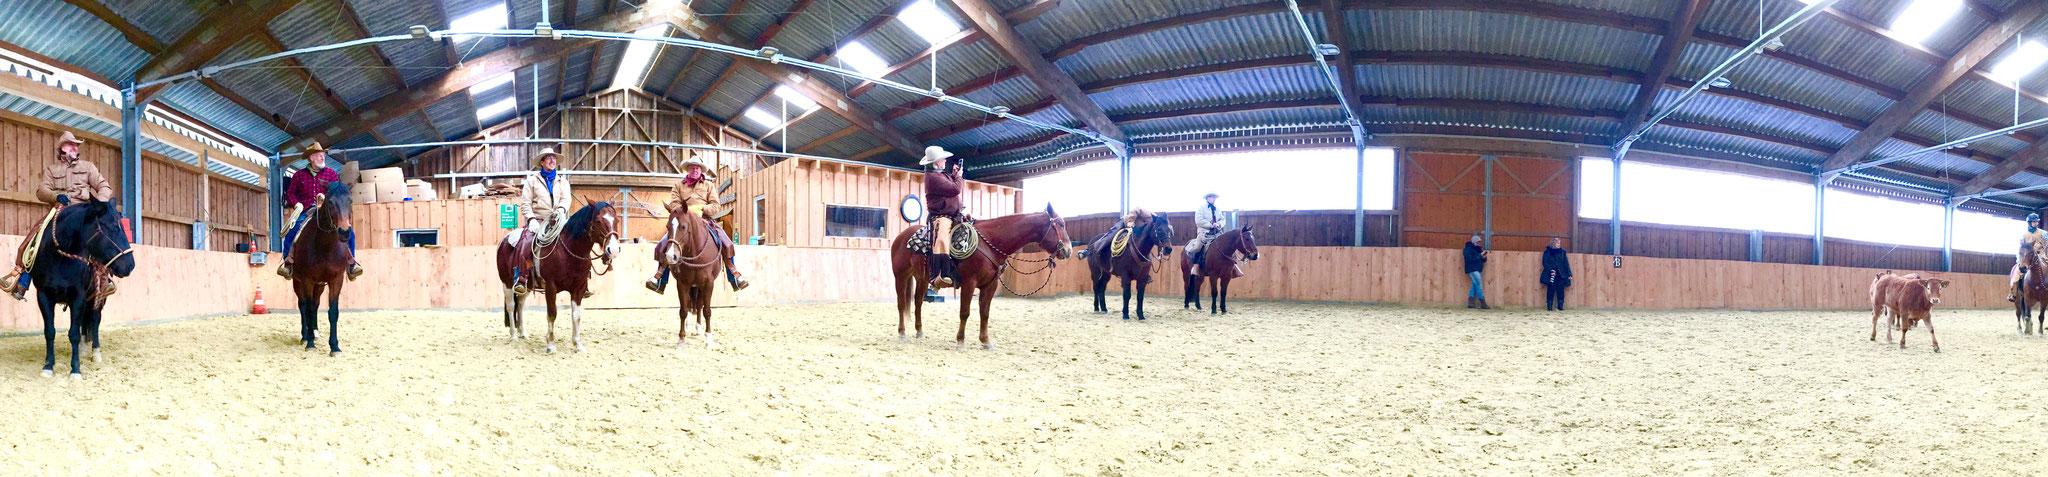 (C) JBK, Cowboy Kurs, Geisbach Ranch, Eifel 2016